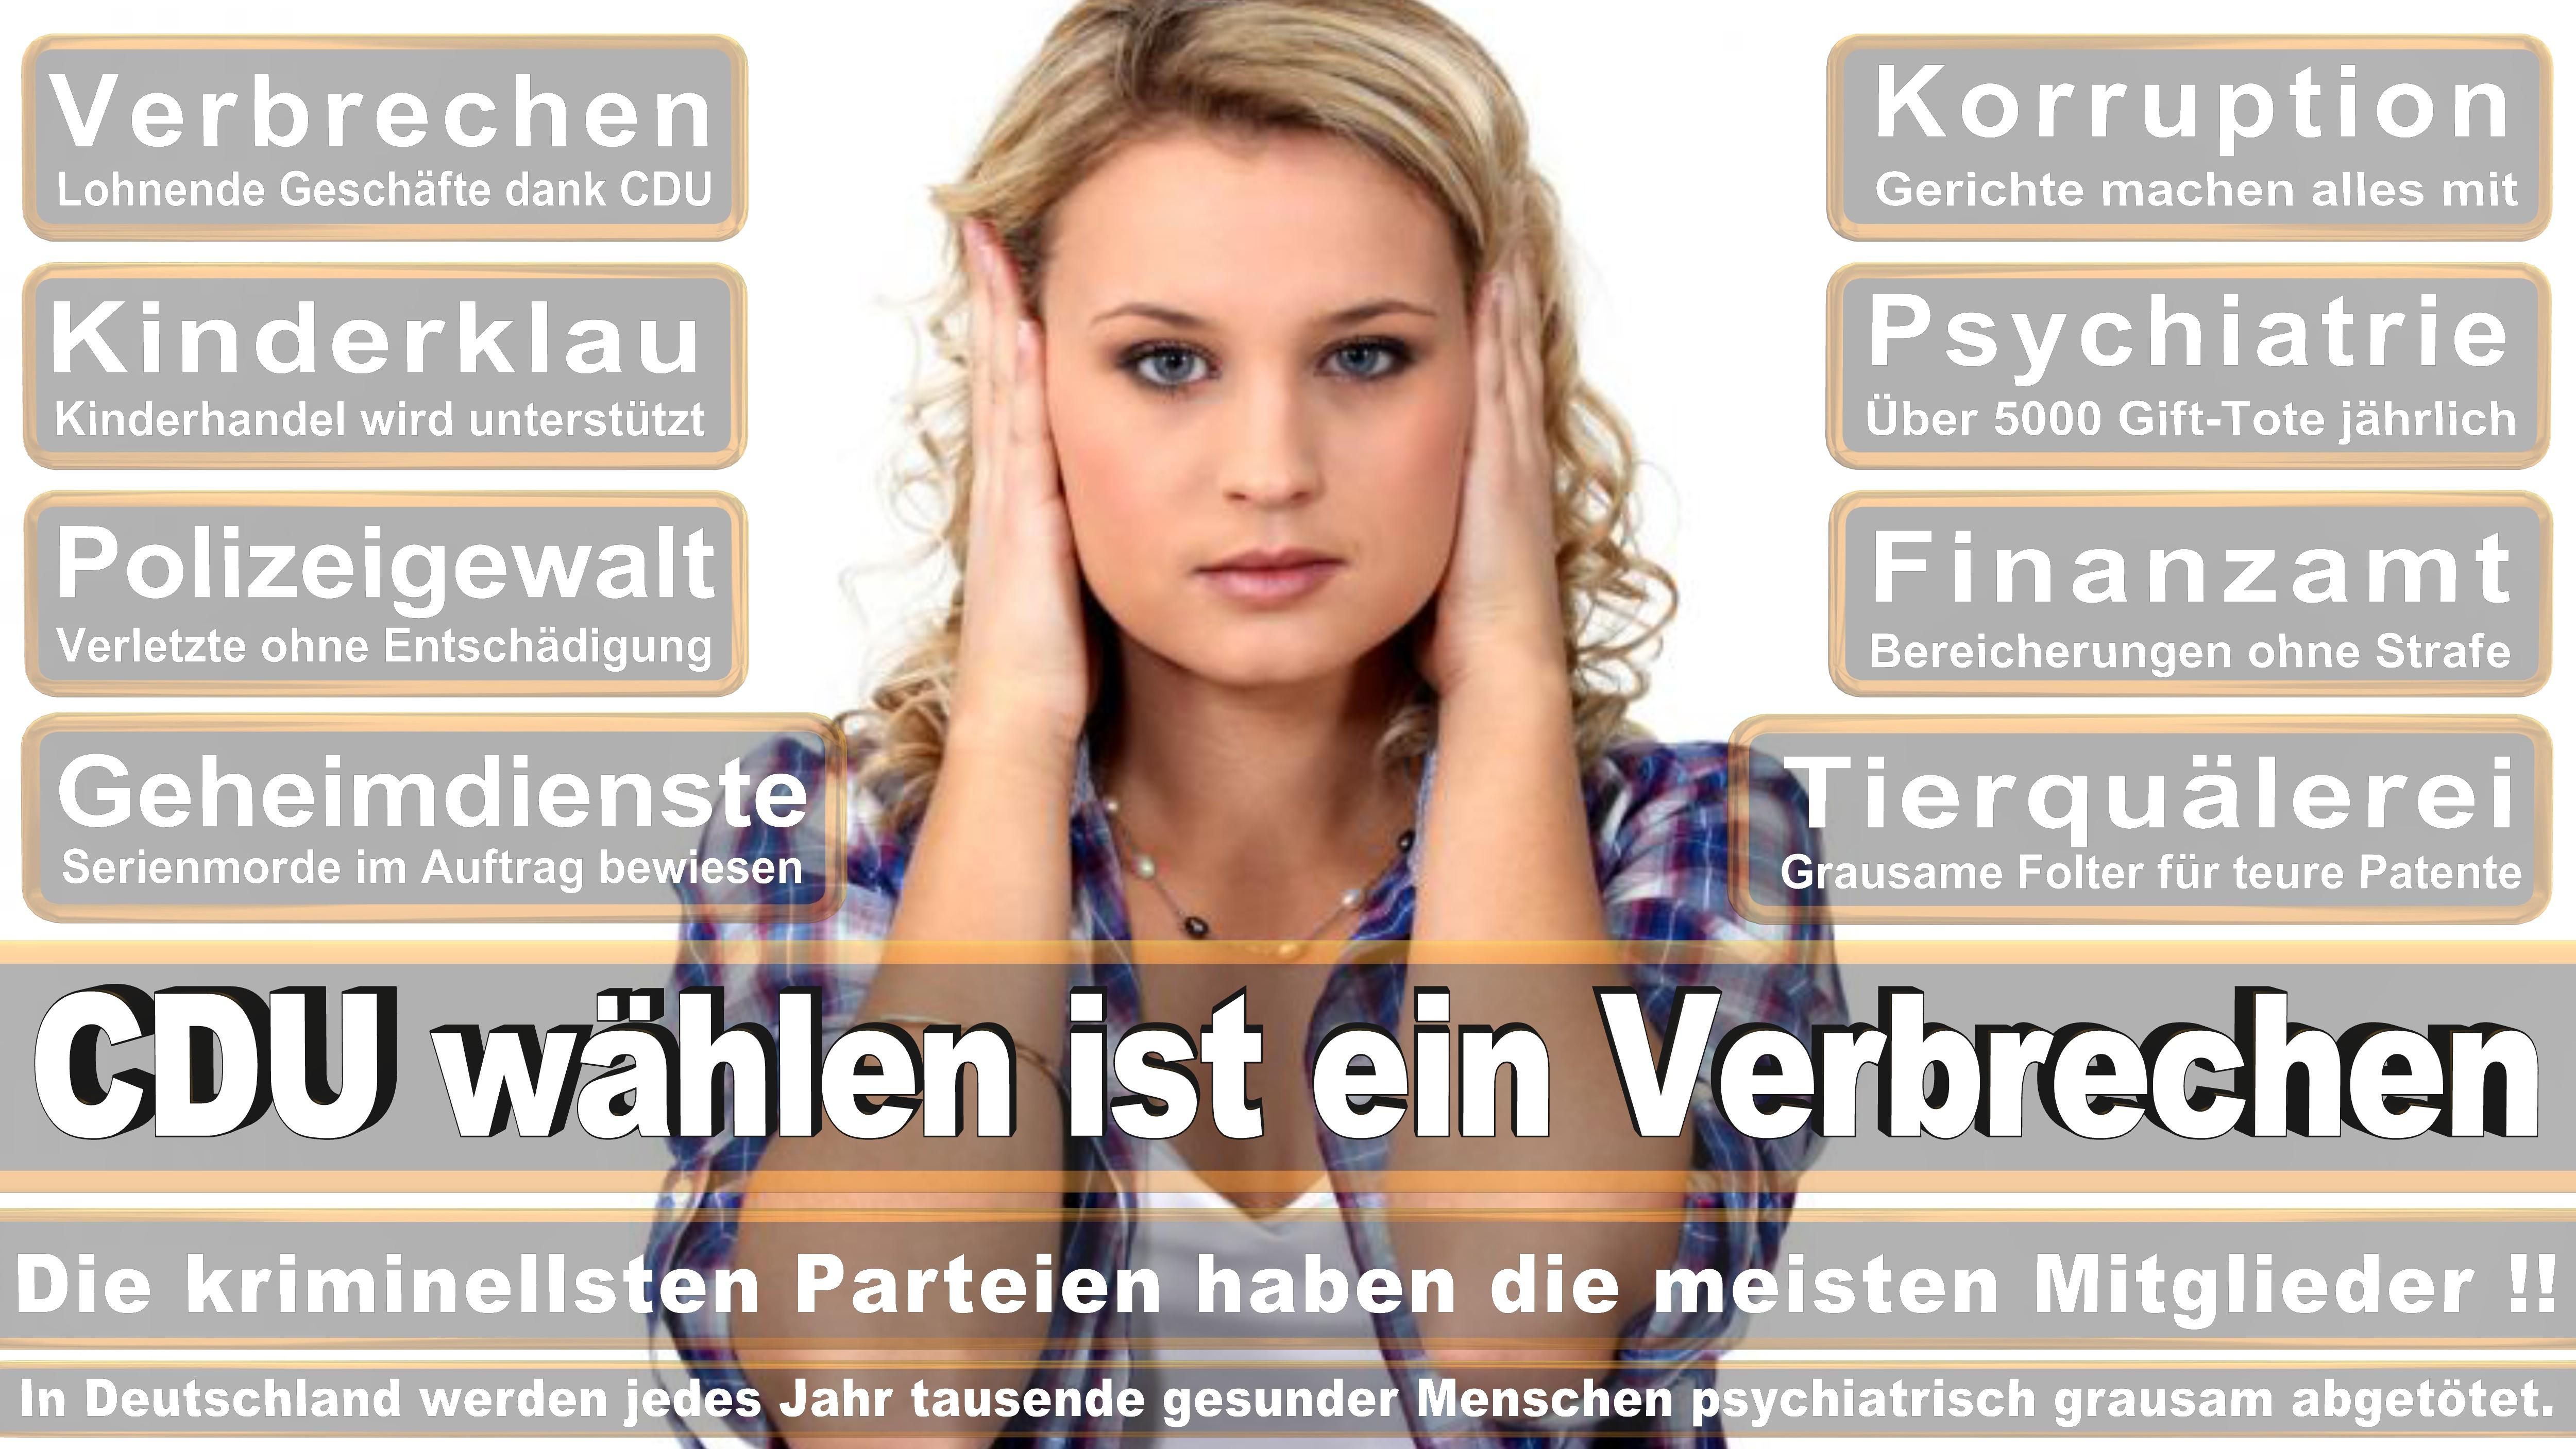 Elisabeth Winkelmeier Becker CDU CSU Politiker